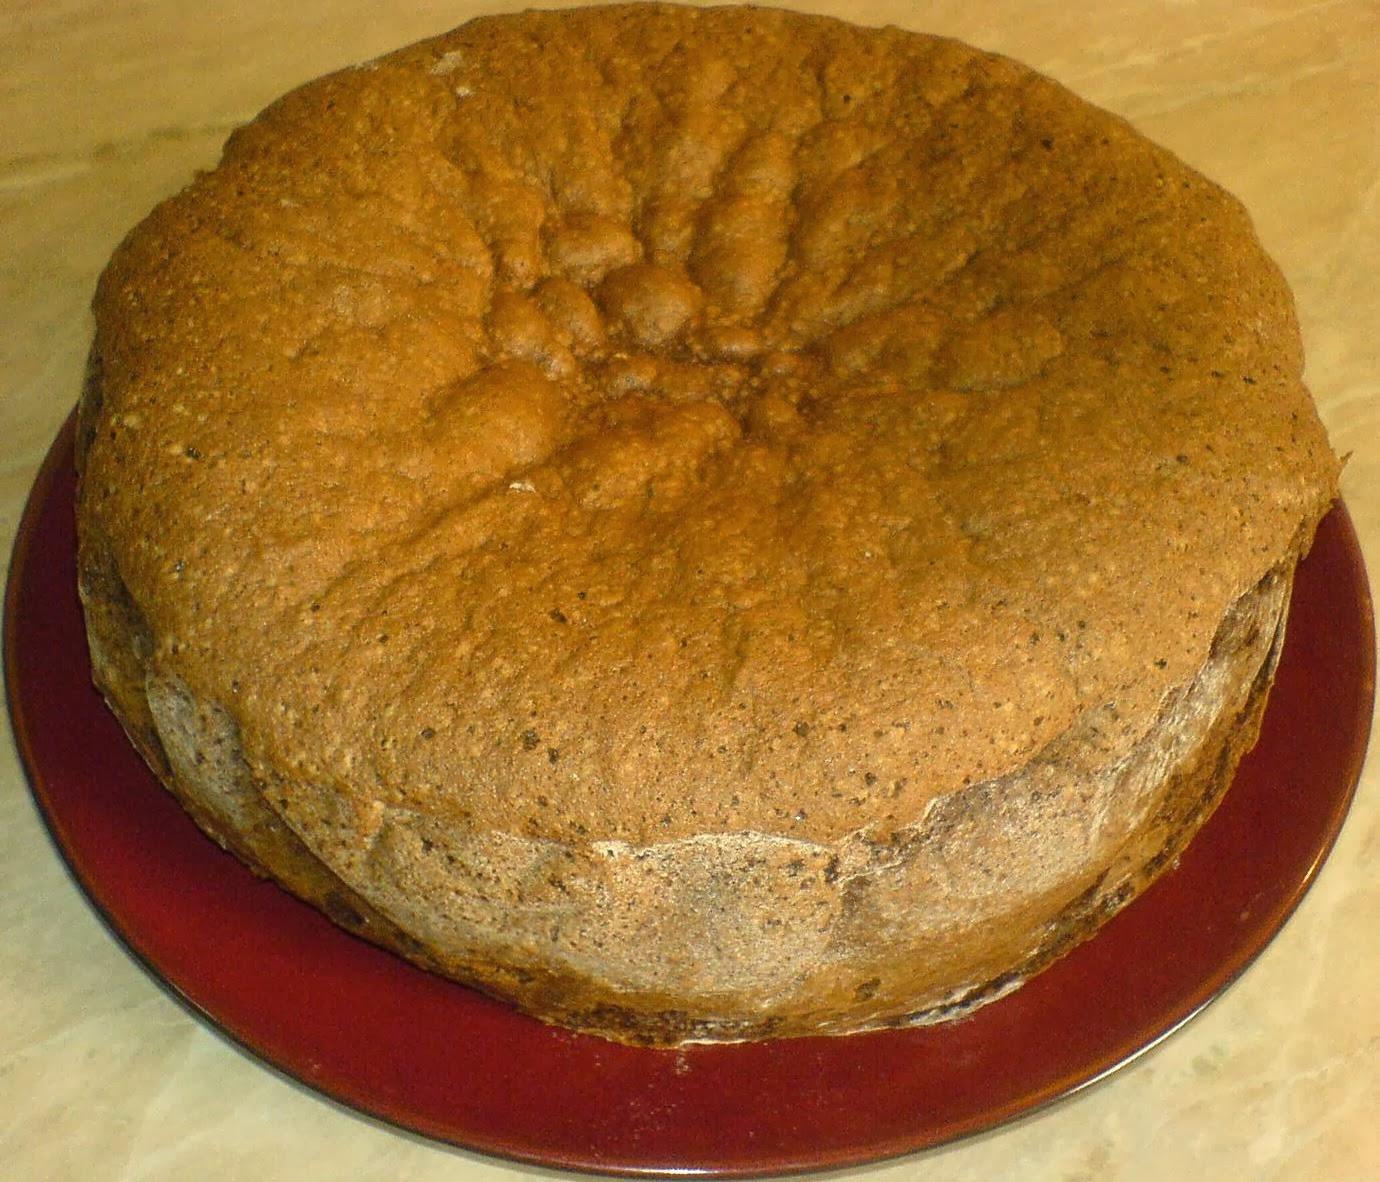 blat de tort, blat de tort cu cacao, pandispan, pandispan de ciocolata, prajituri, dulciuri, torturi, retete culinare,